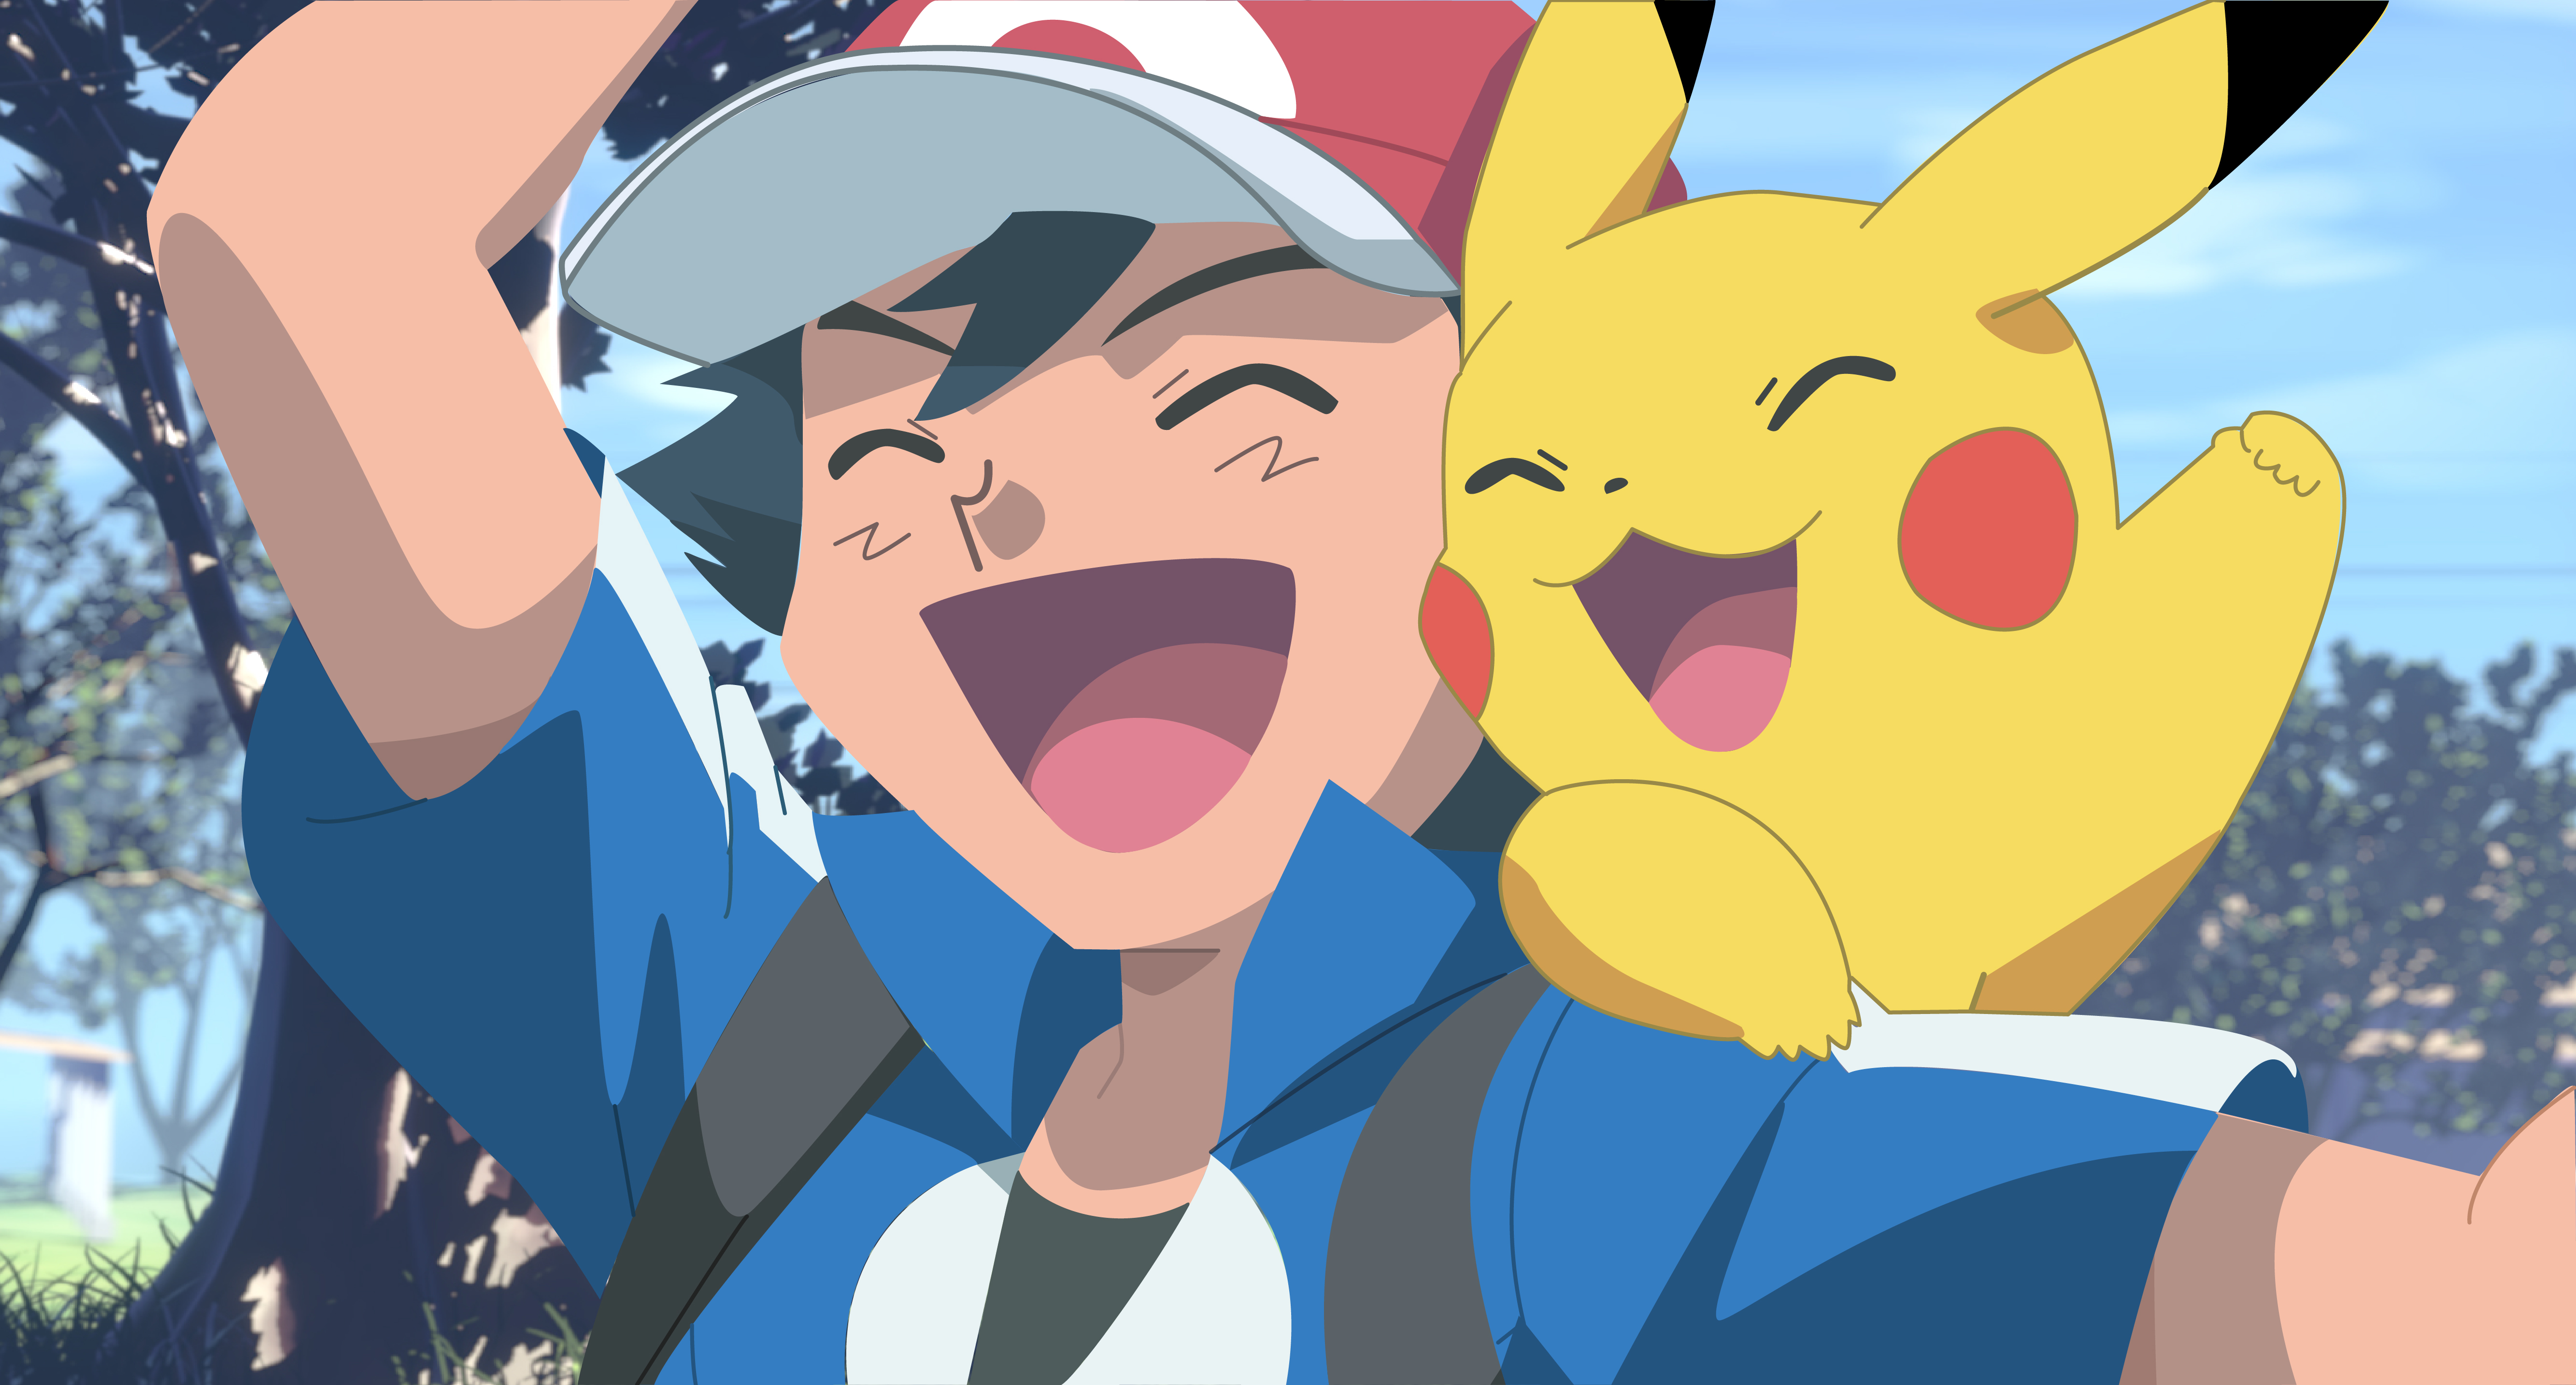 pokemon ash and pikachu by luchoxfive on deviantart